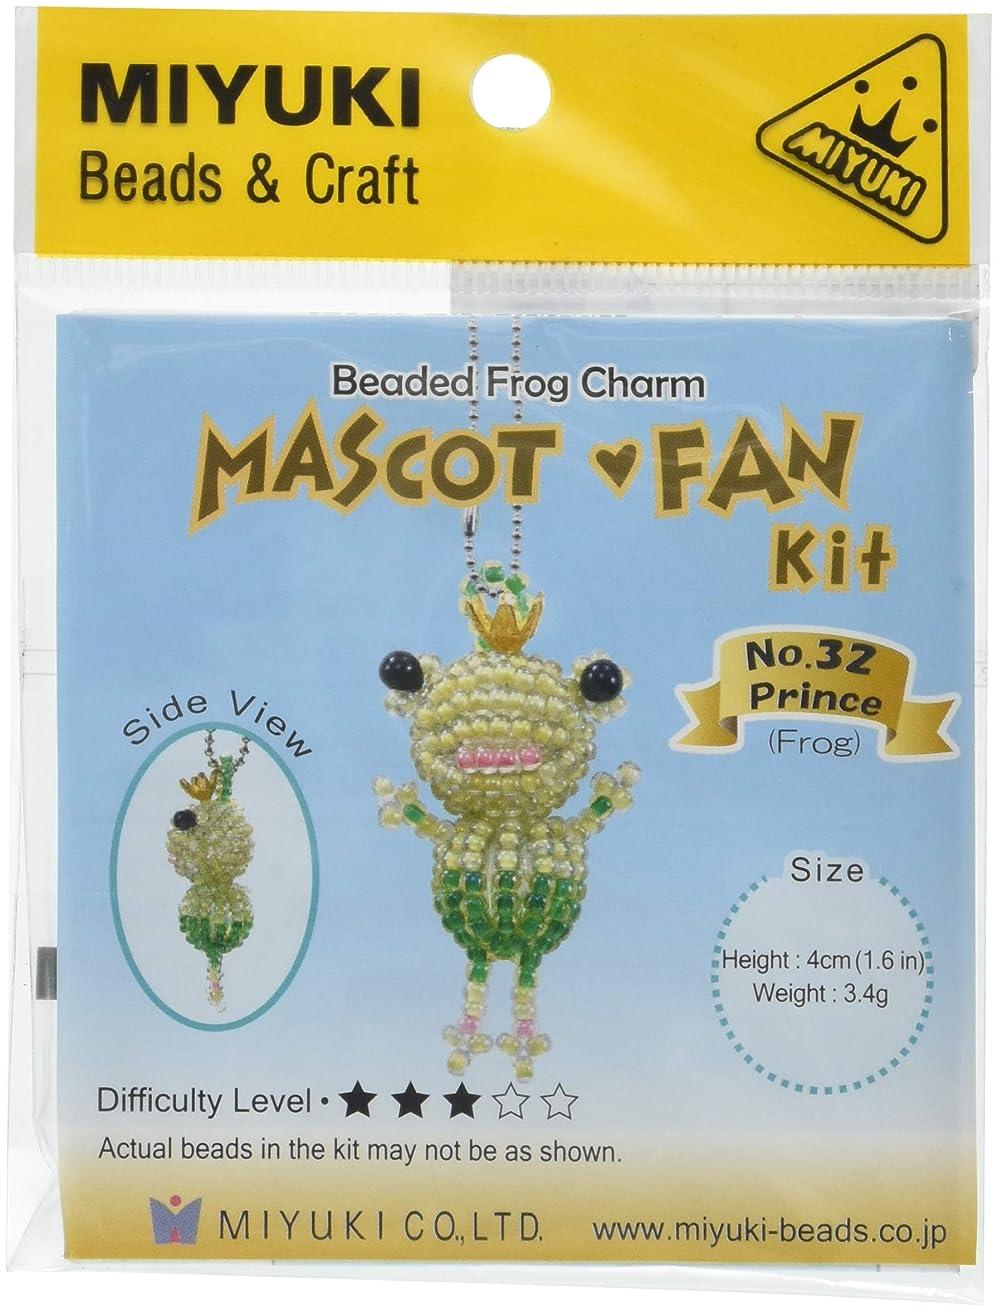 Miyuki Bead Kit, Frog Prince Charm, MFK32, 1-Kit